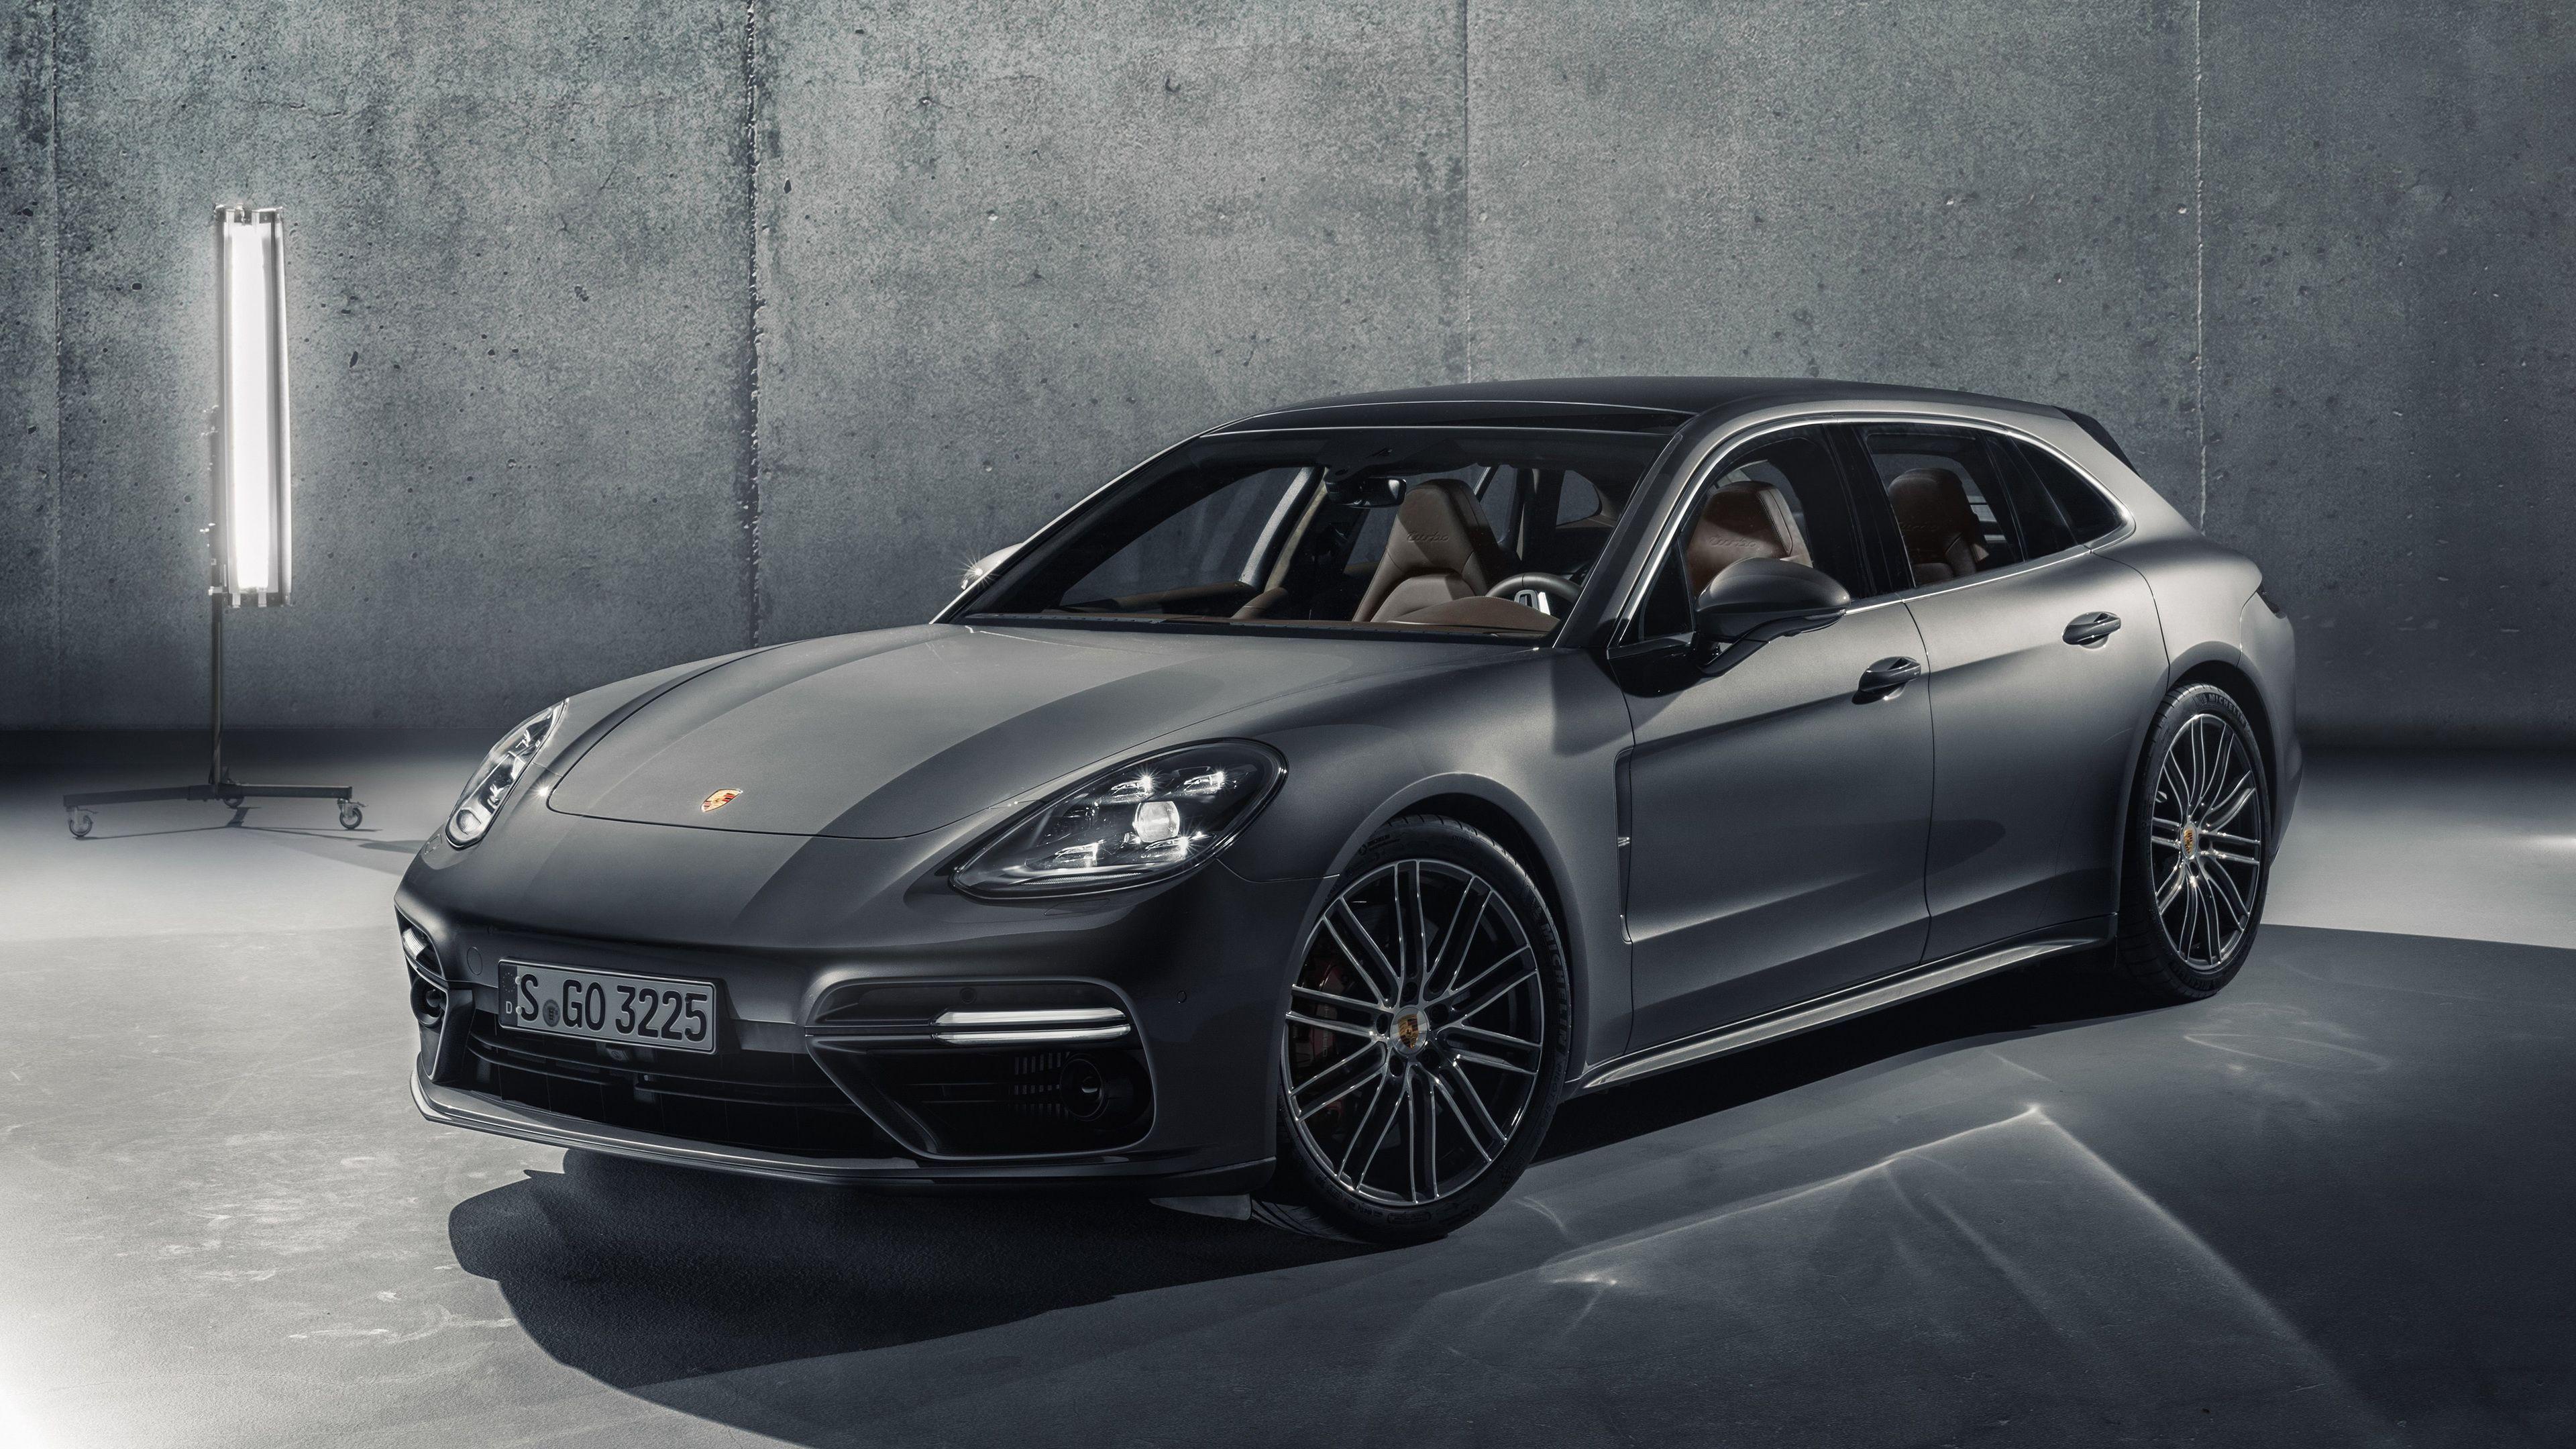 2018 Porsche Panamera Sport Turismo porsche wallpapers